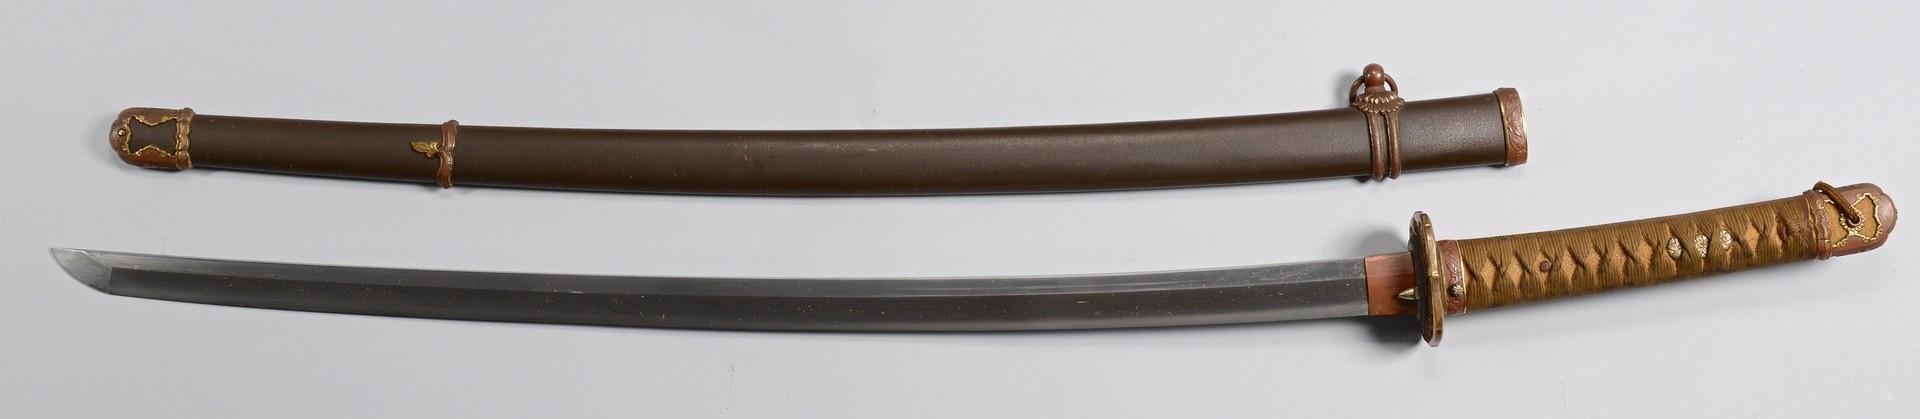 Lot 532: WWII Era Japanese Sword w/ Bronze Mounts